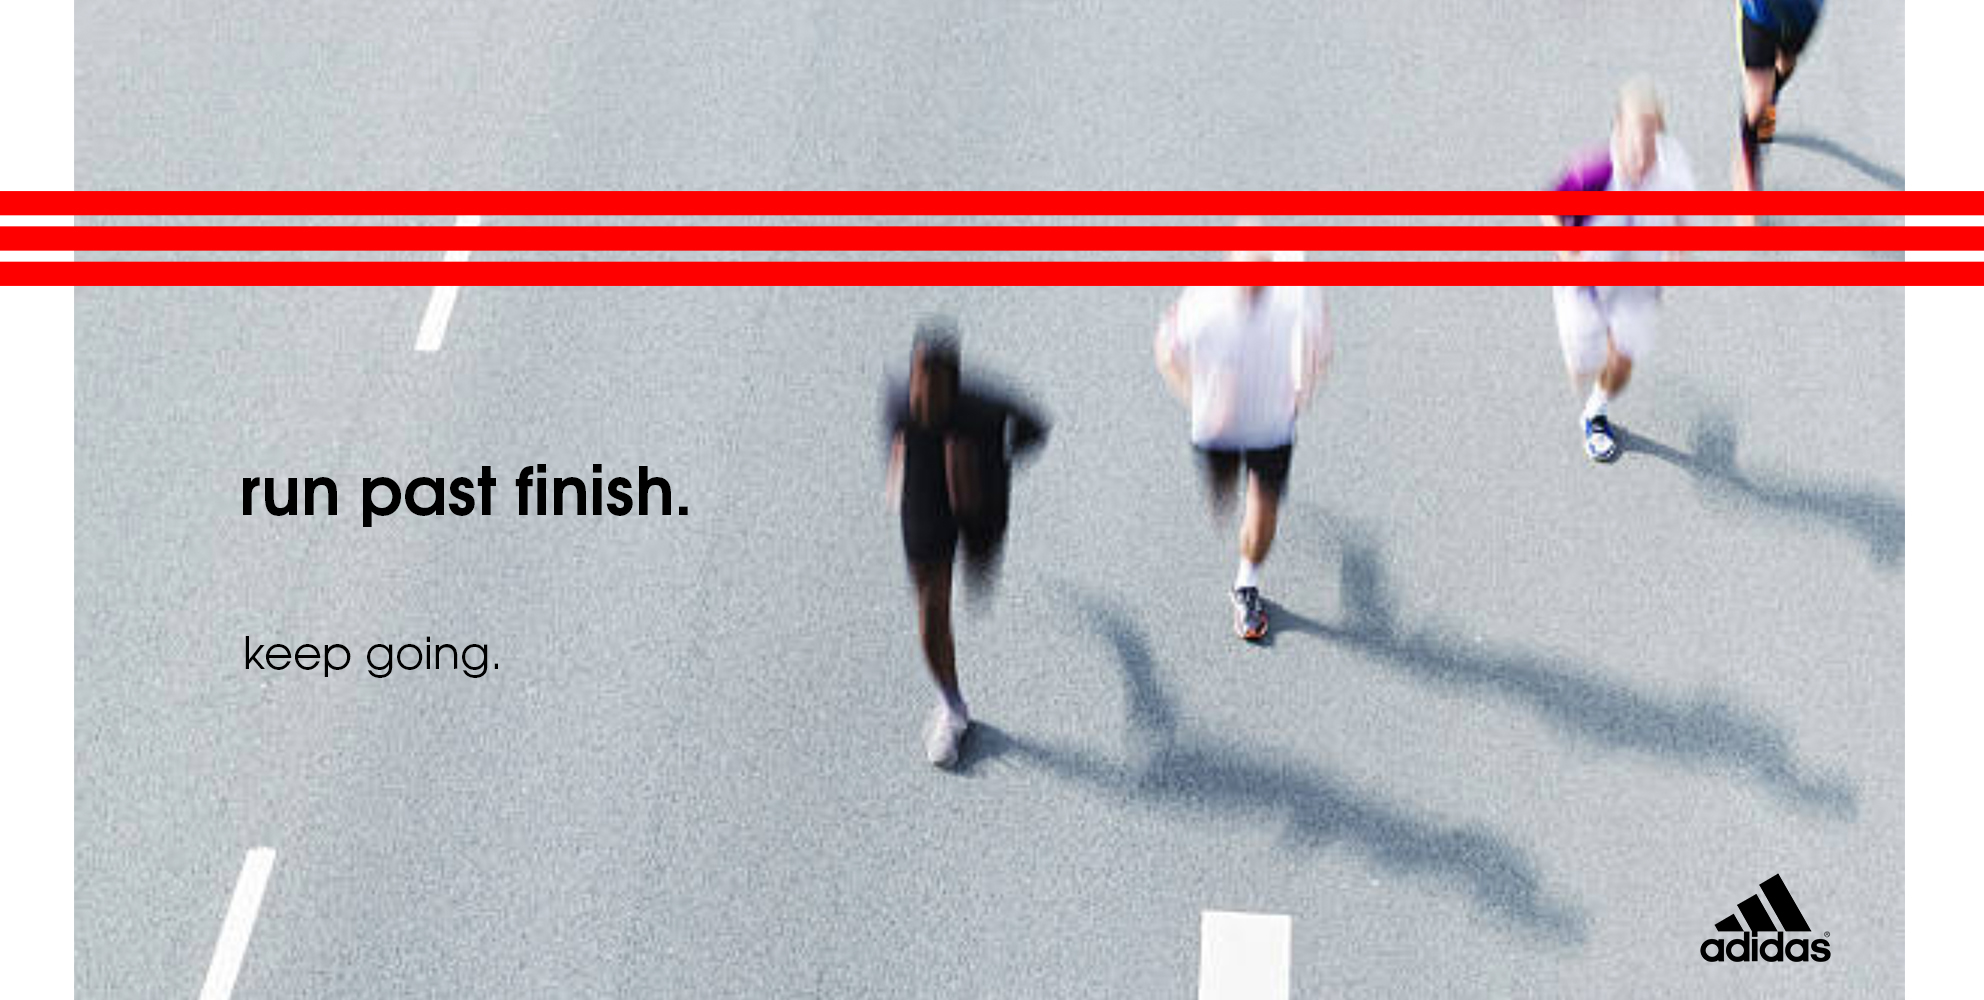 Adidas Ad Campaign Run Past Finish Mel Blanchard Gong_street runner.jpg